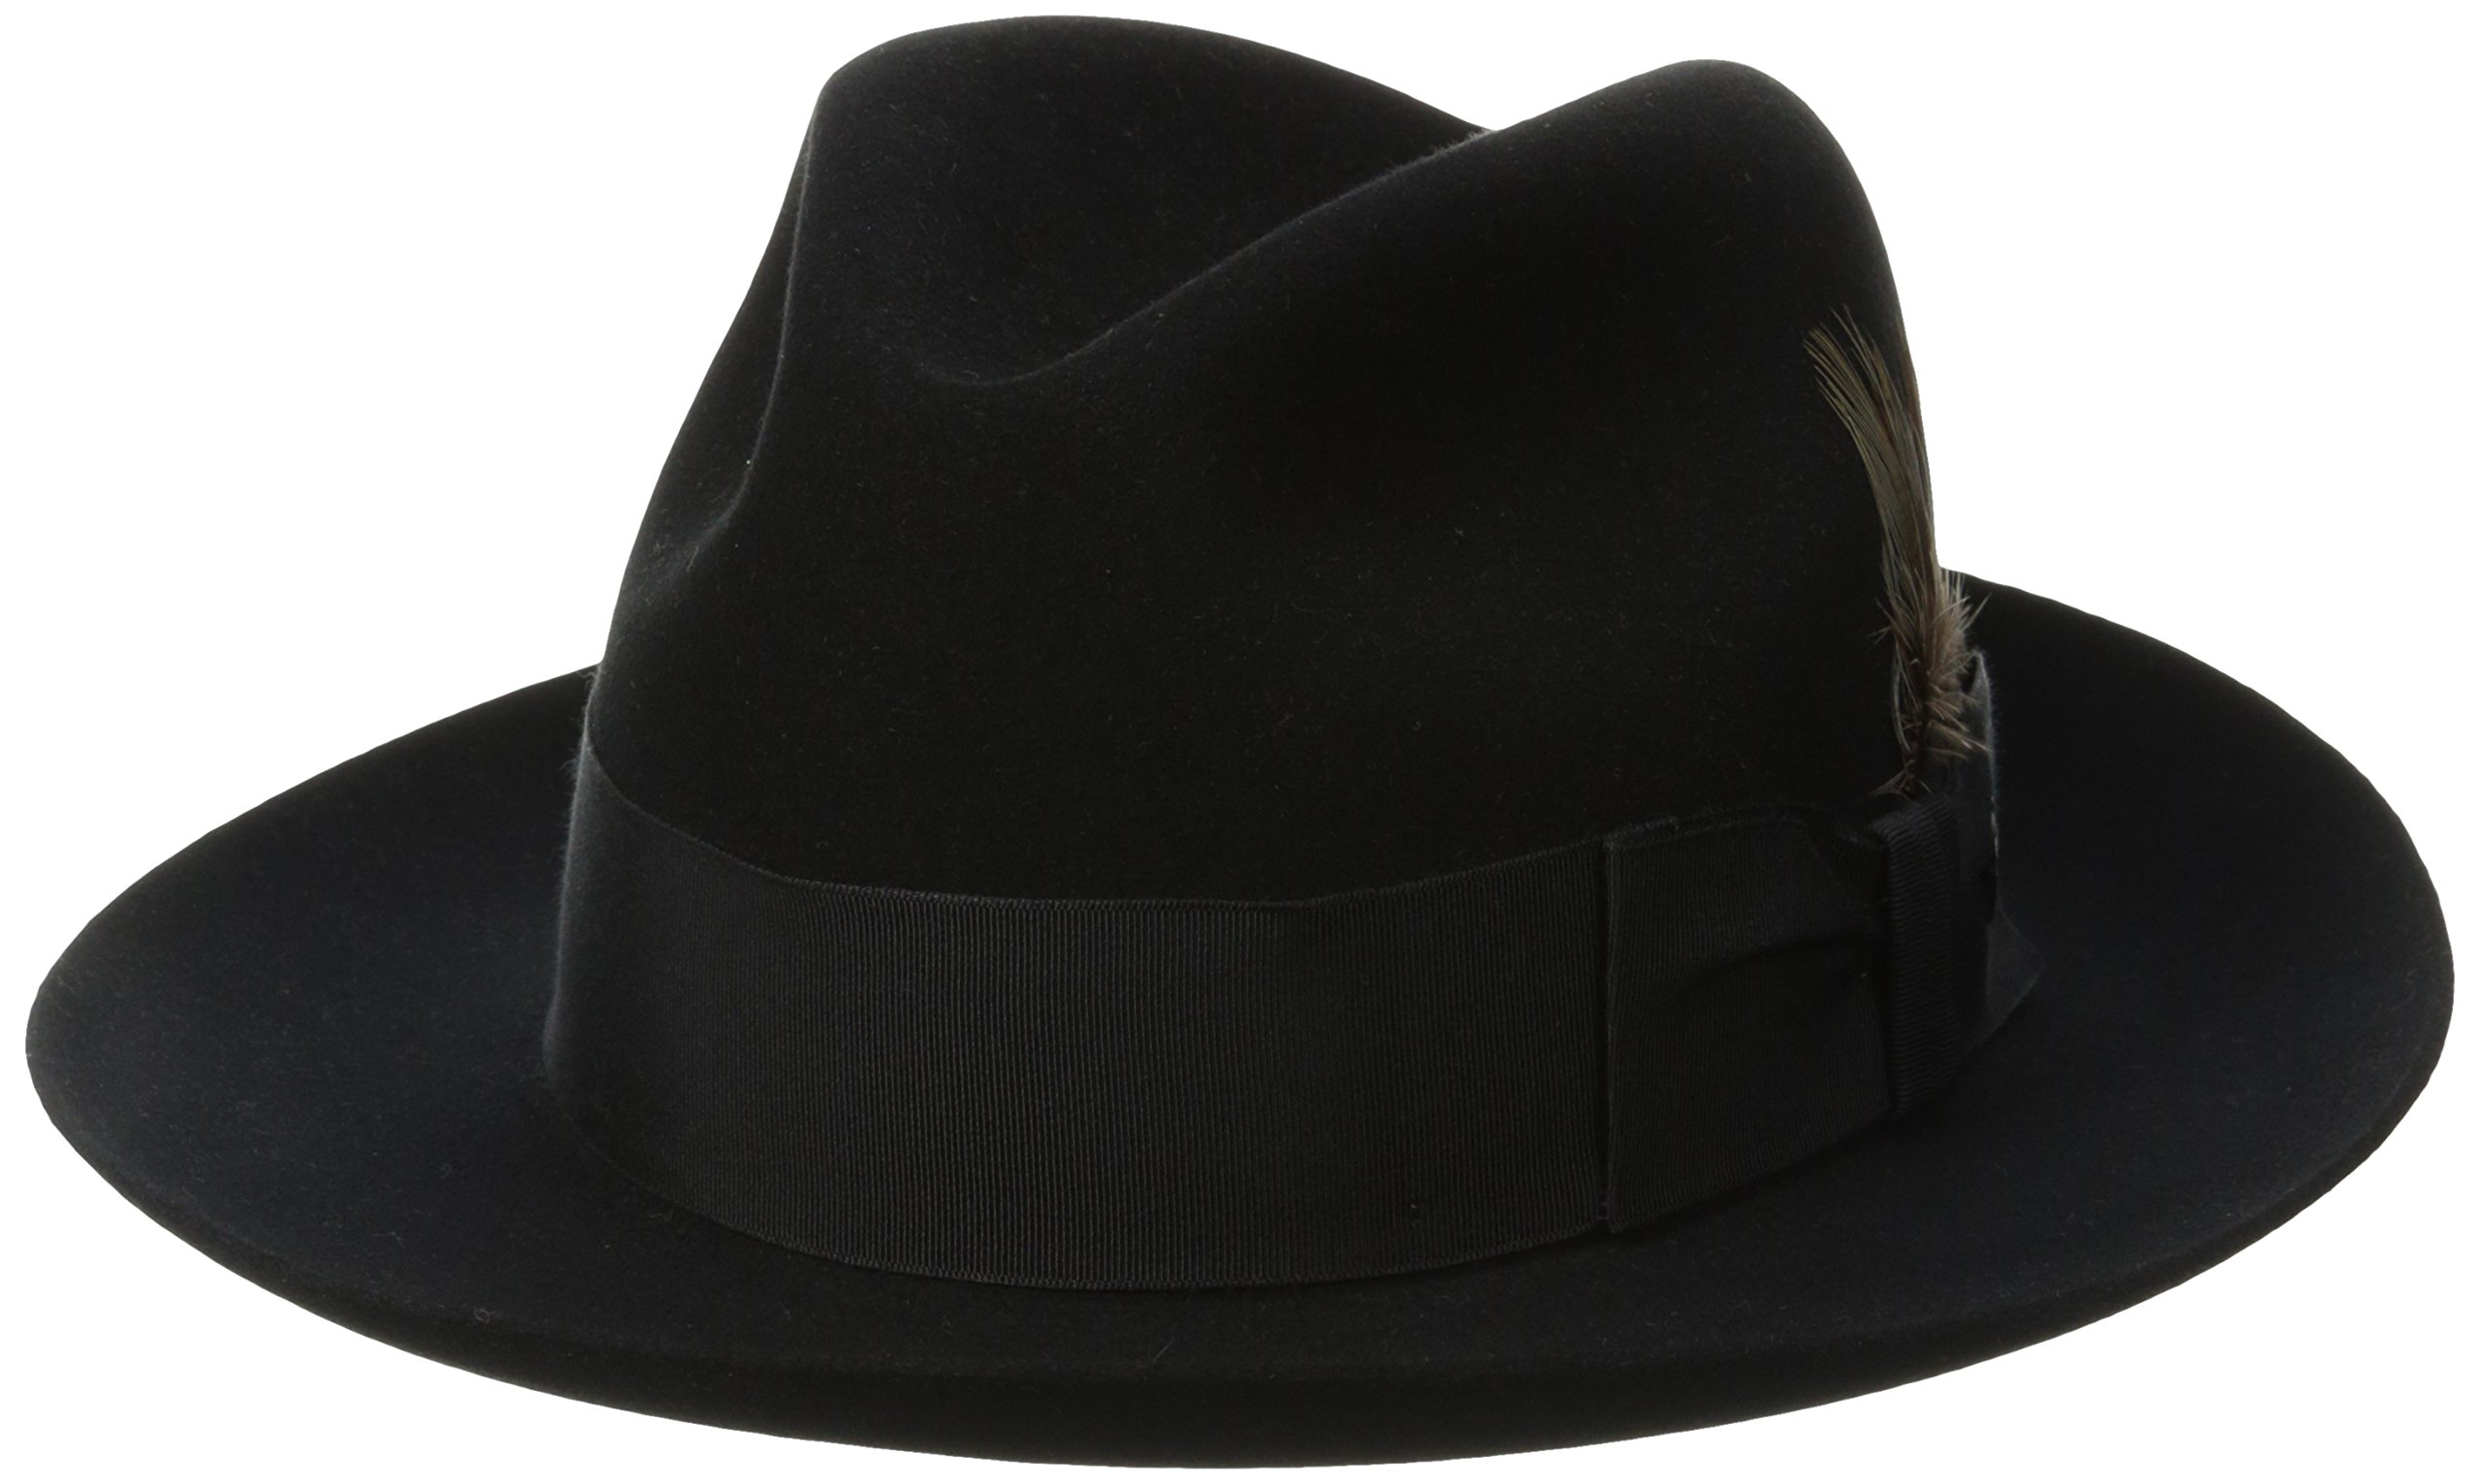 Stetson Men's Sttson Temple Royal Deluxe Fur Felt Hat, Black, 7